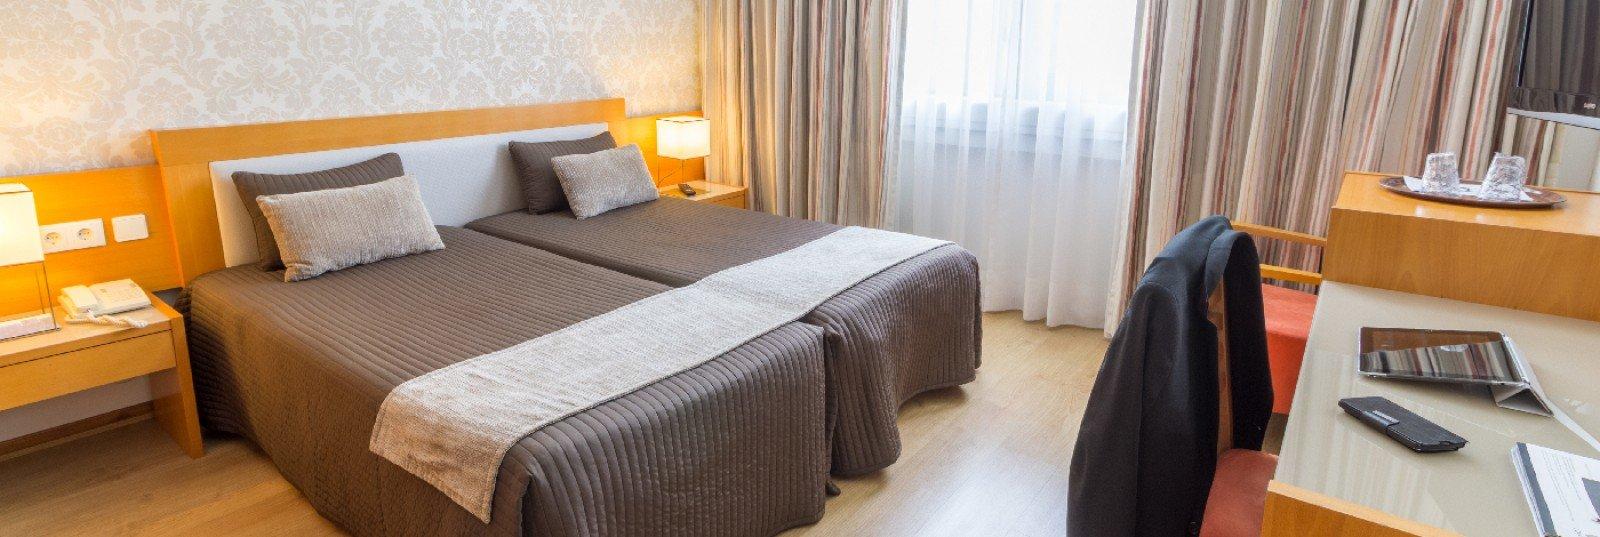 Hotel Eurosol Leiria - Twin Room